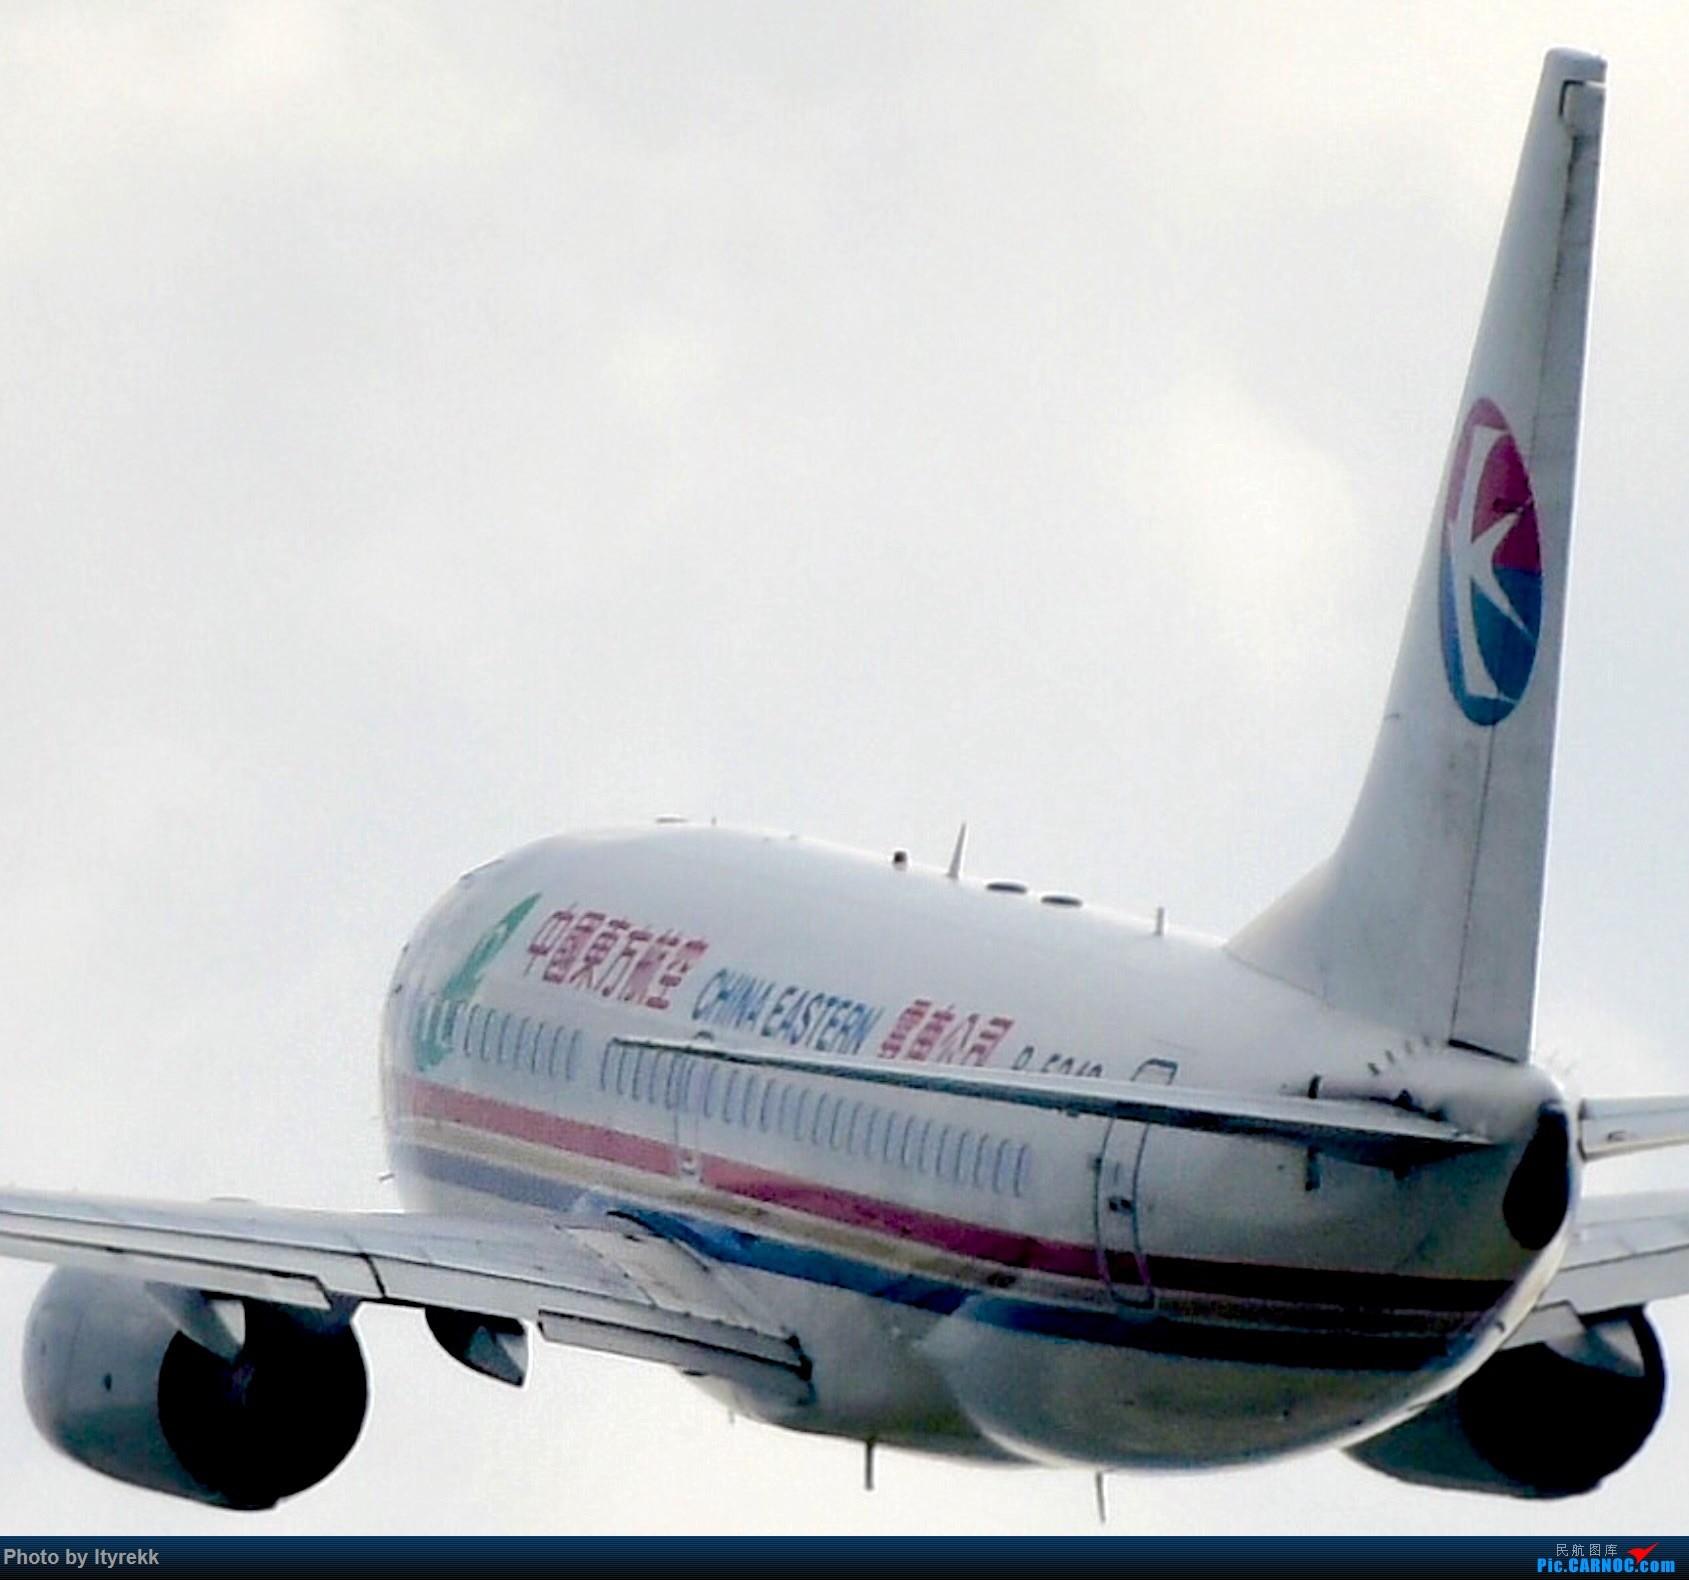 Re:[原创]【5.23LUM】玩腻了楼顶拍,来一次现场版的!求小飞机 BOEING 737-700 B-5242 中国芒市机场